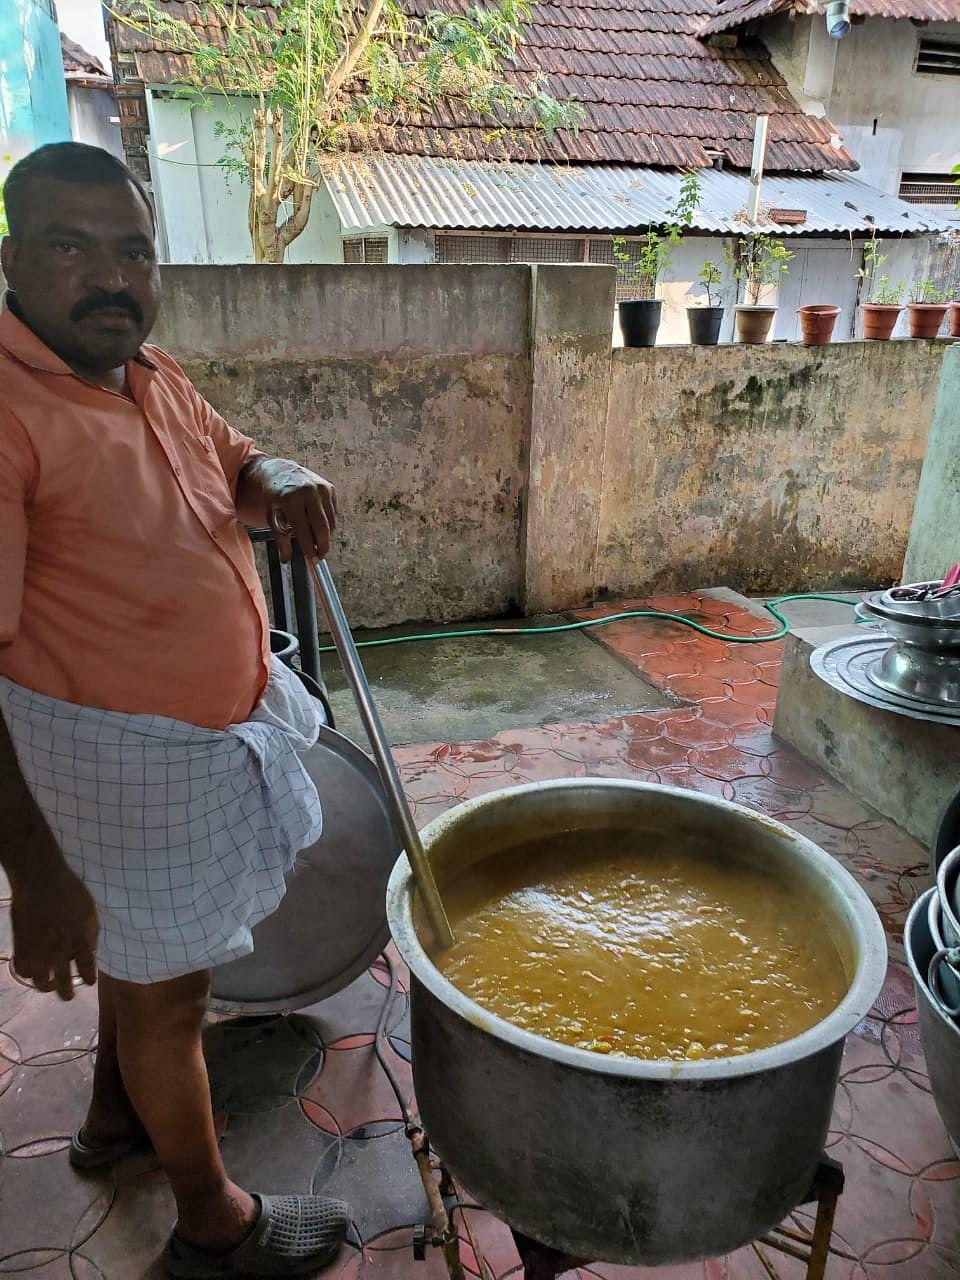 kitchen community run by film fraternity in Kochi